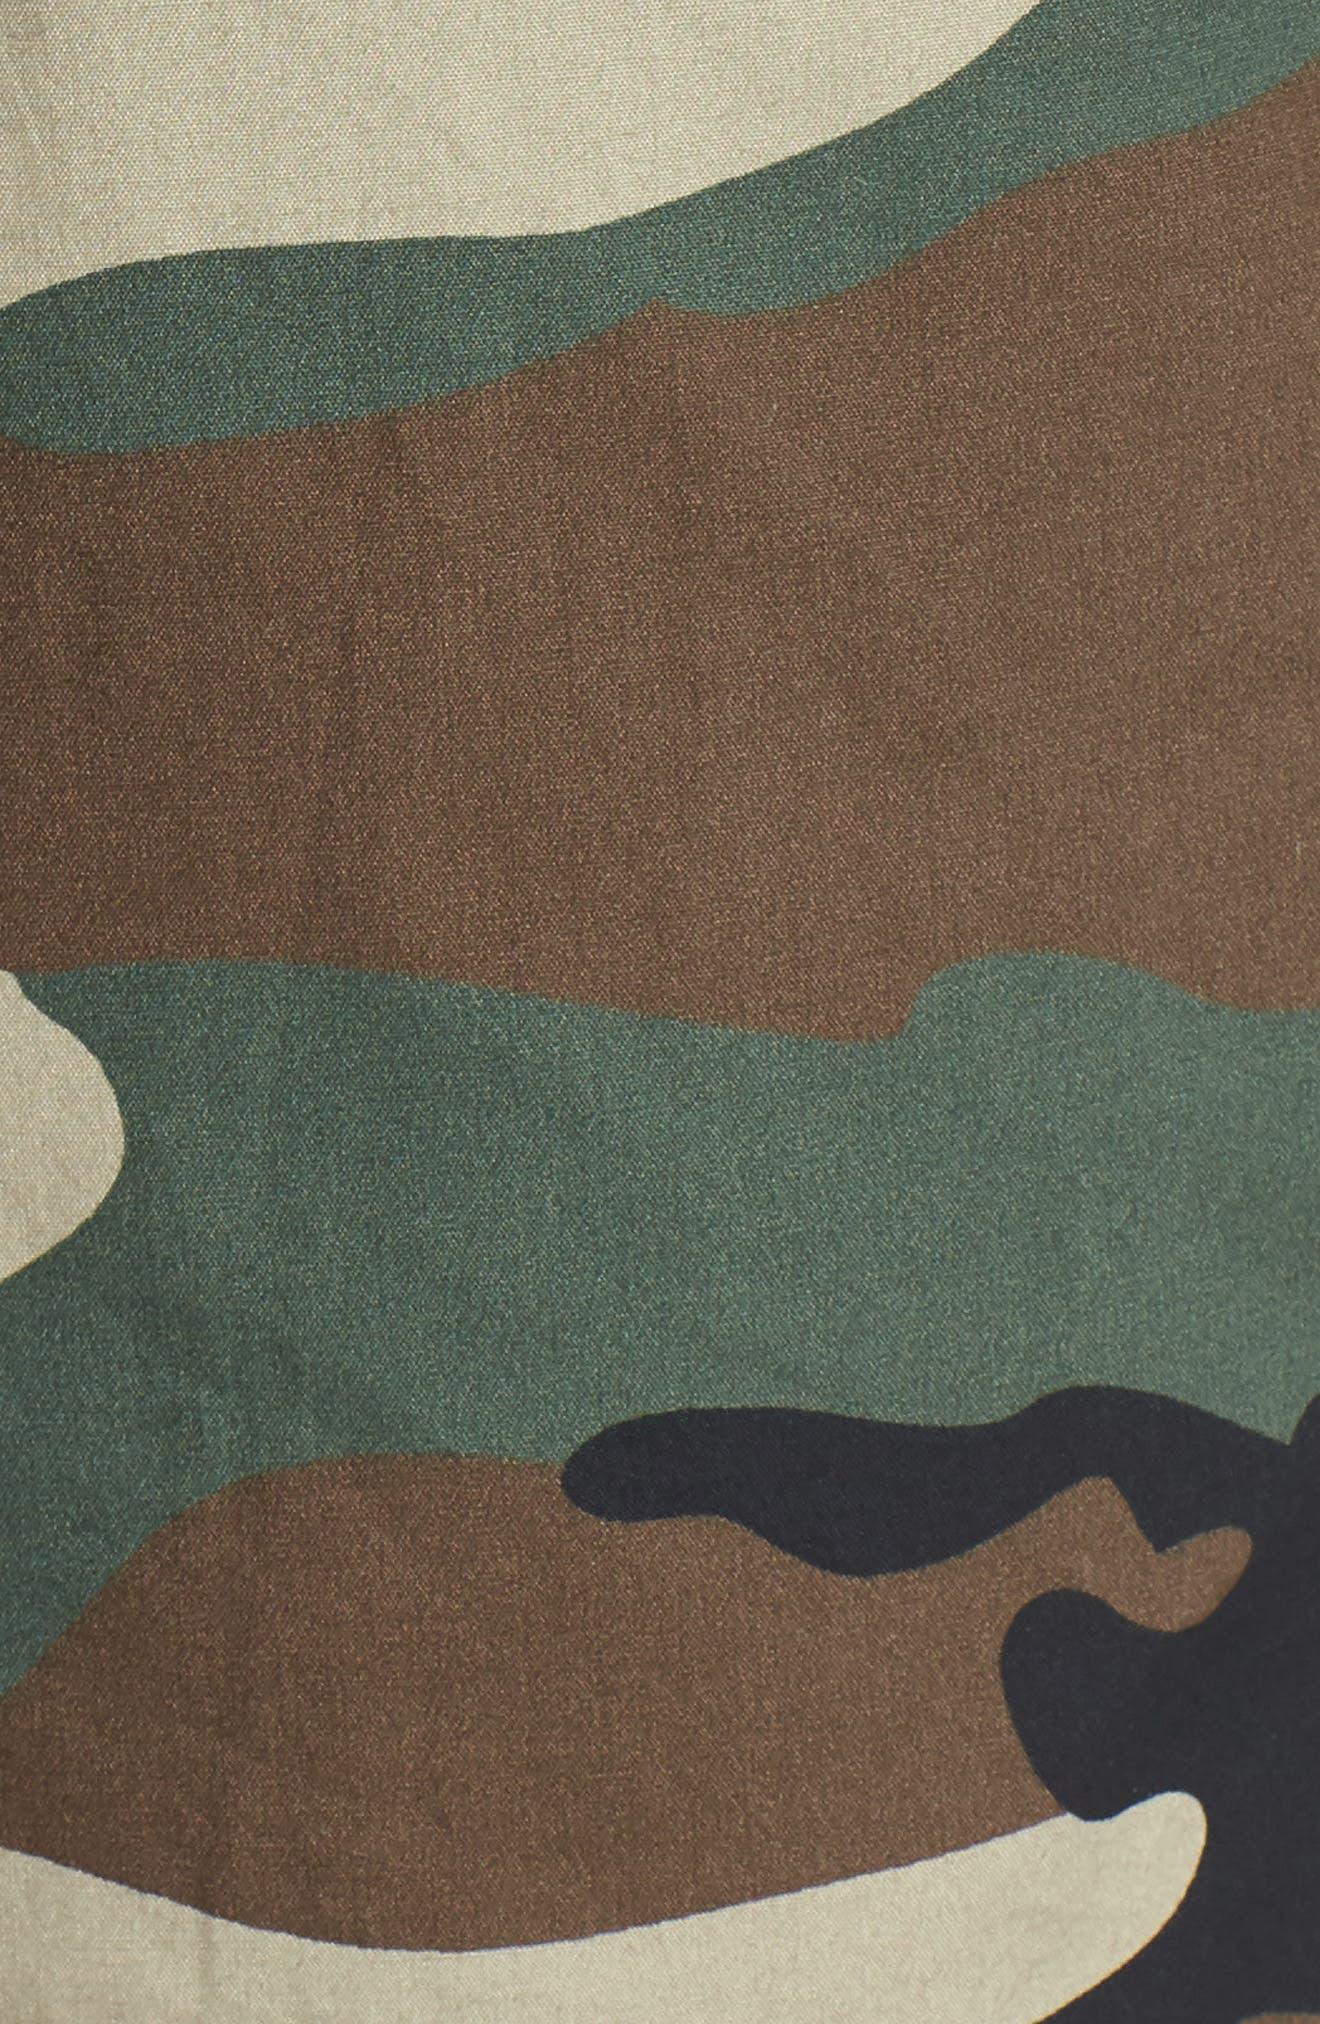 Subversion Shorts,                             Alternate thumbnail 5, color,                             Field Camo